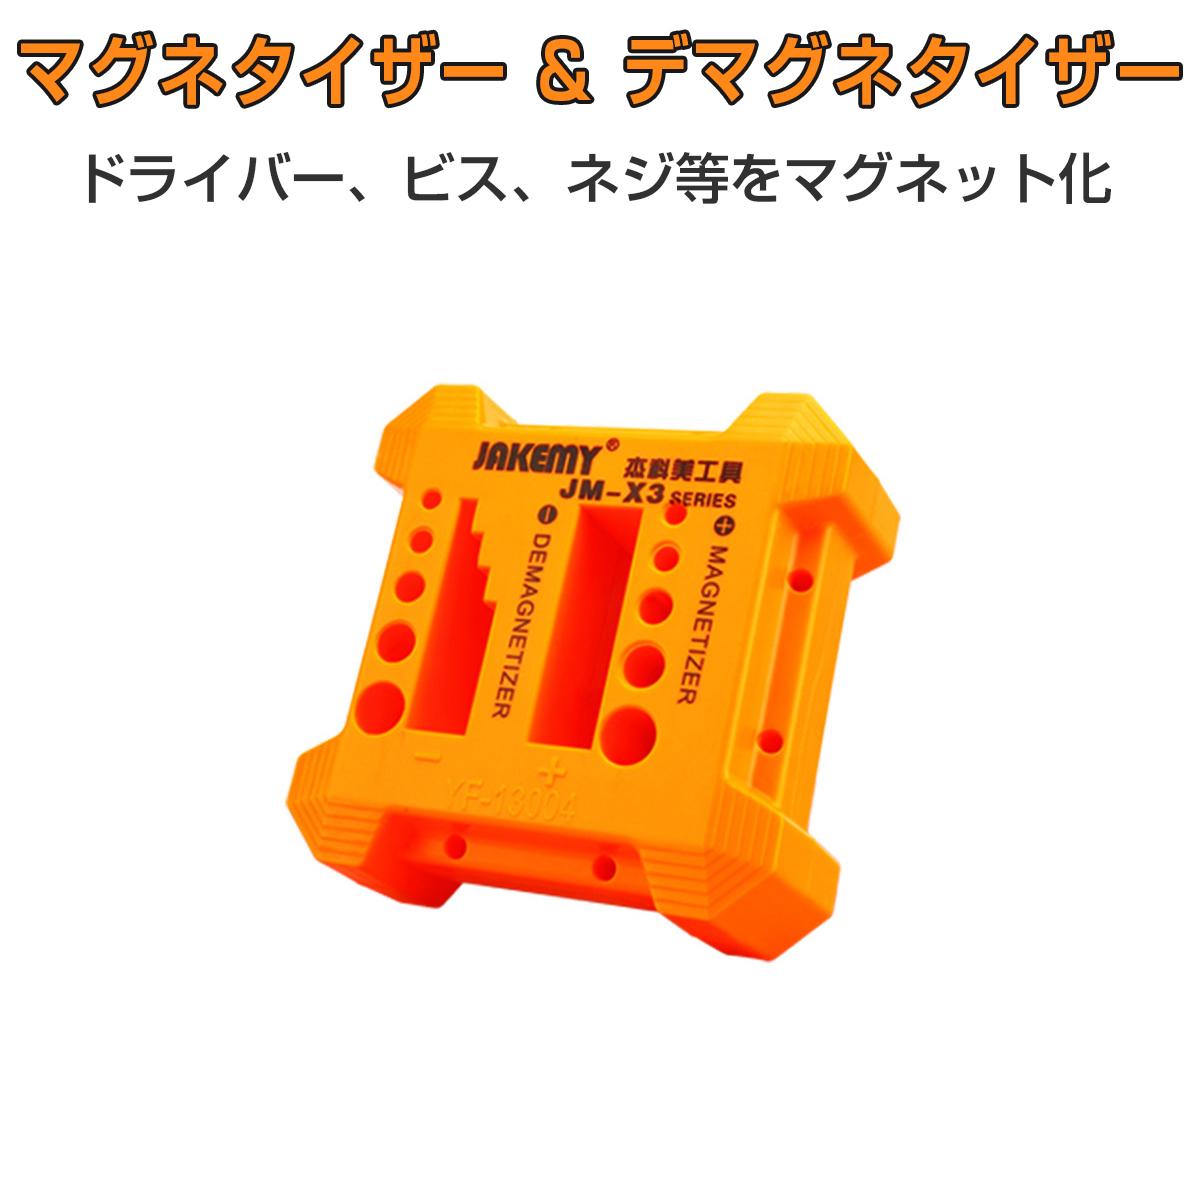 JAKEMY マグネタイザー デマグネタイザー 磁石 マグネット化 非マグネット化 手持ちの金属工具が簡単に磁石化できる 磁気化 着磁 消磁 帯磁 脱磁 ドライバー ピンセット ネジ ビス クリップ 1ヶ月保証